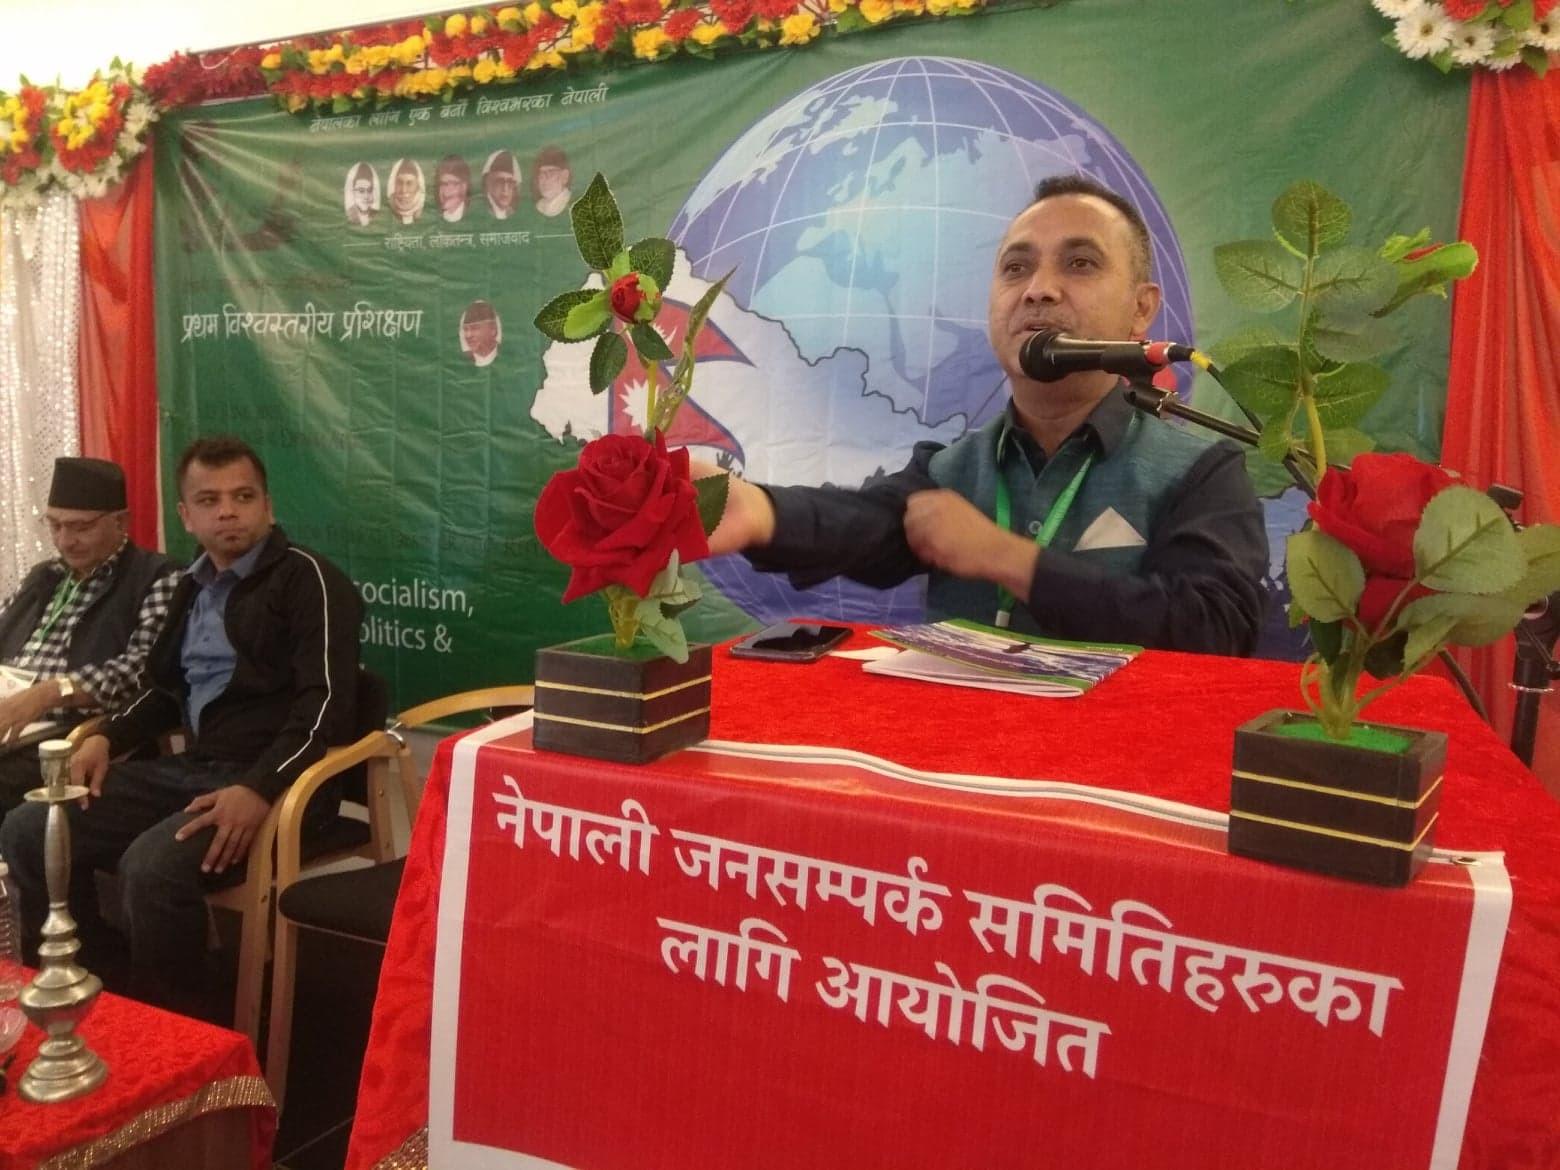 डायस्पोरालाई नेपालसँग गाँस्ने विश्वप्रकाशका सूत्र